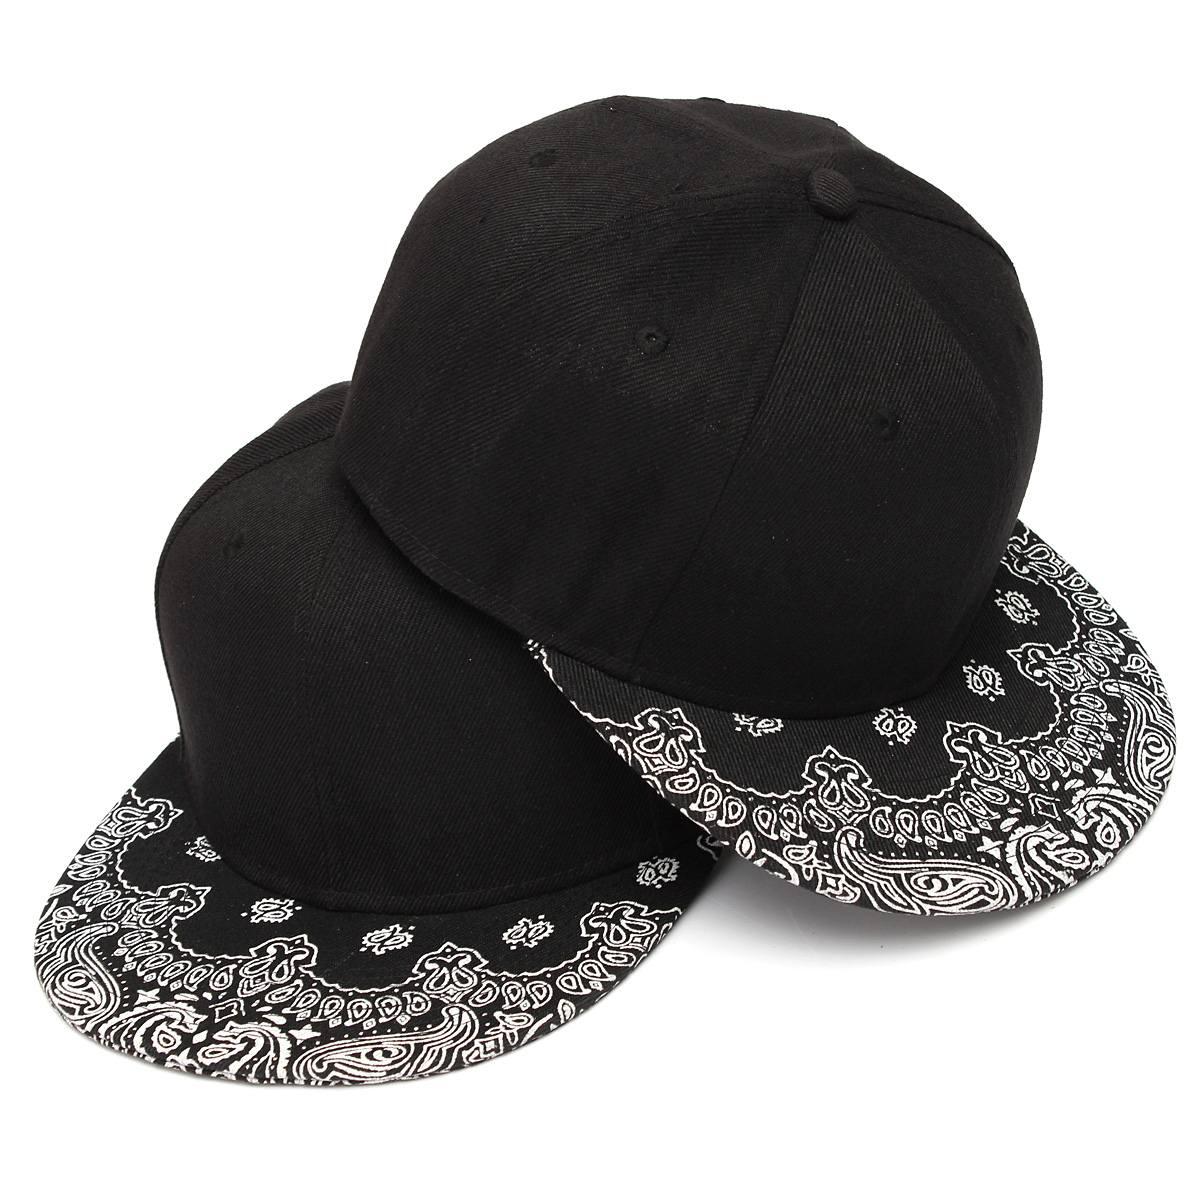 New Paisley Black Adult Snapback Hiphop Bboy Hat Adjustable   Baseball     Cap   Unisex